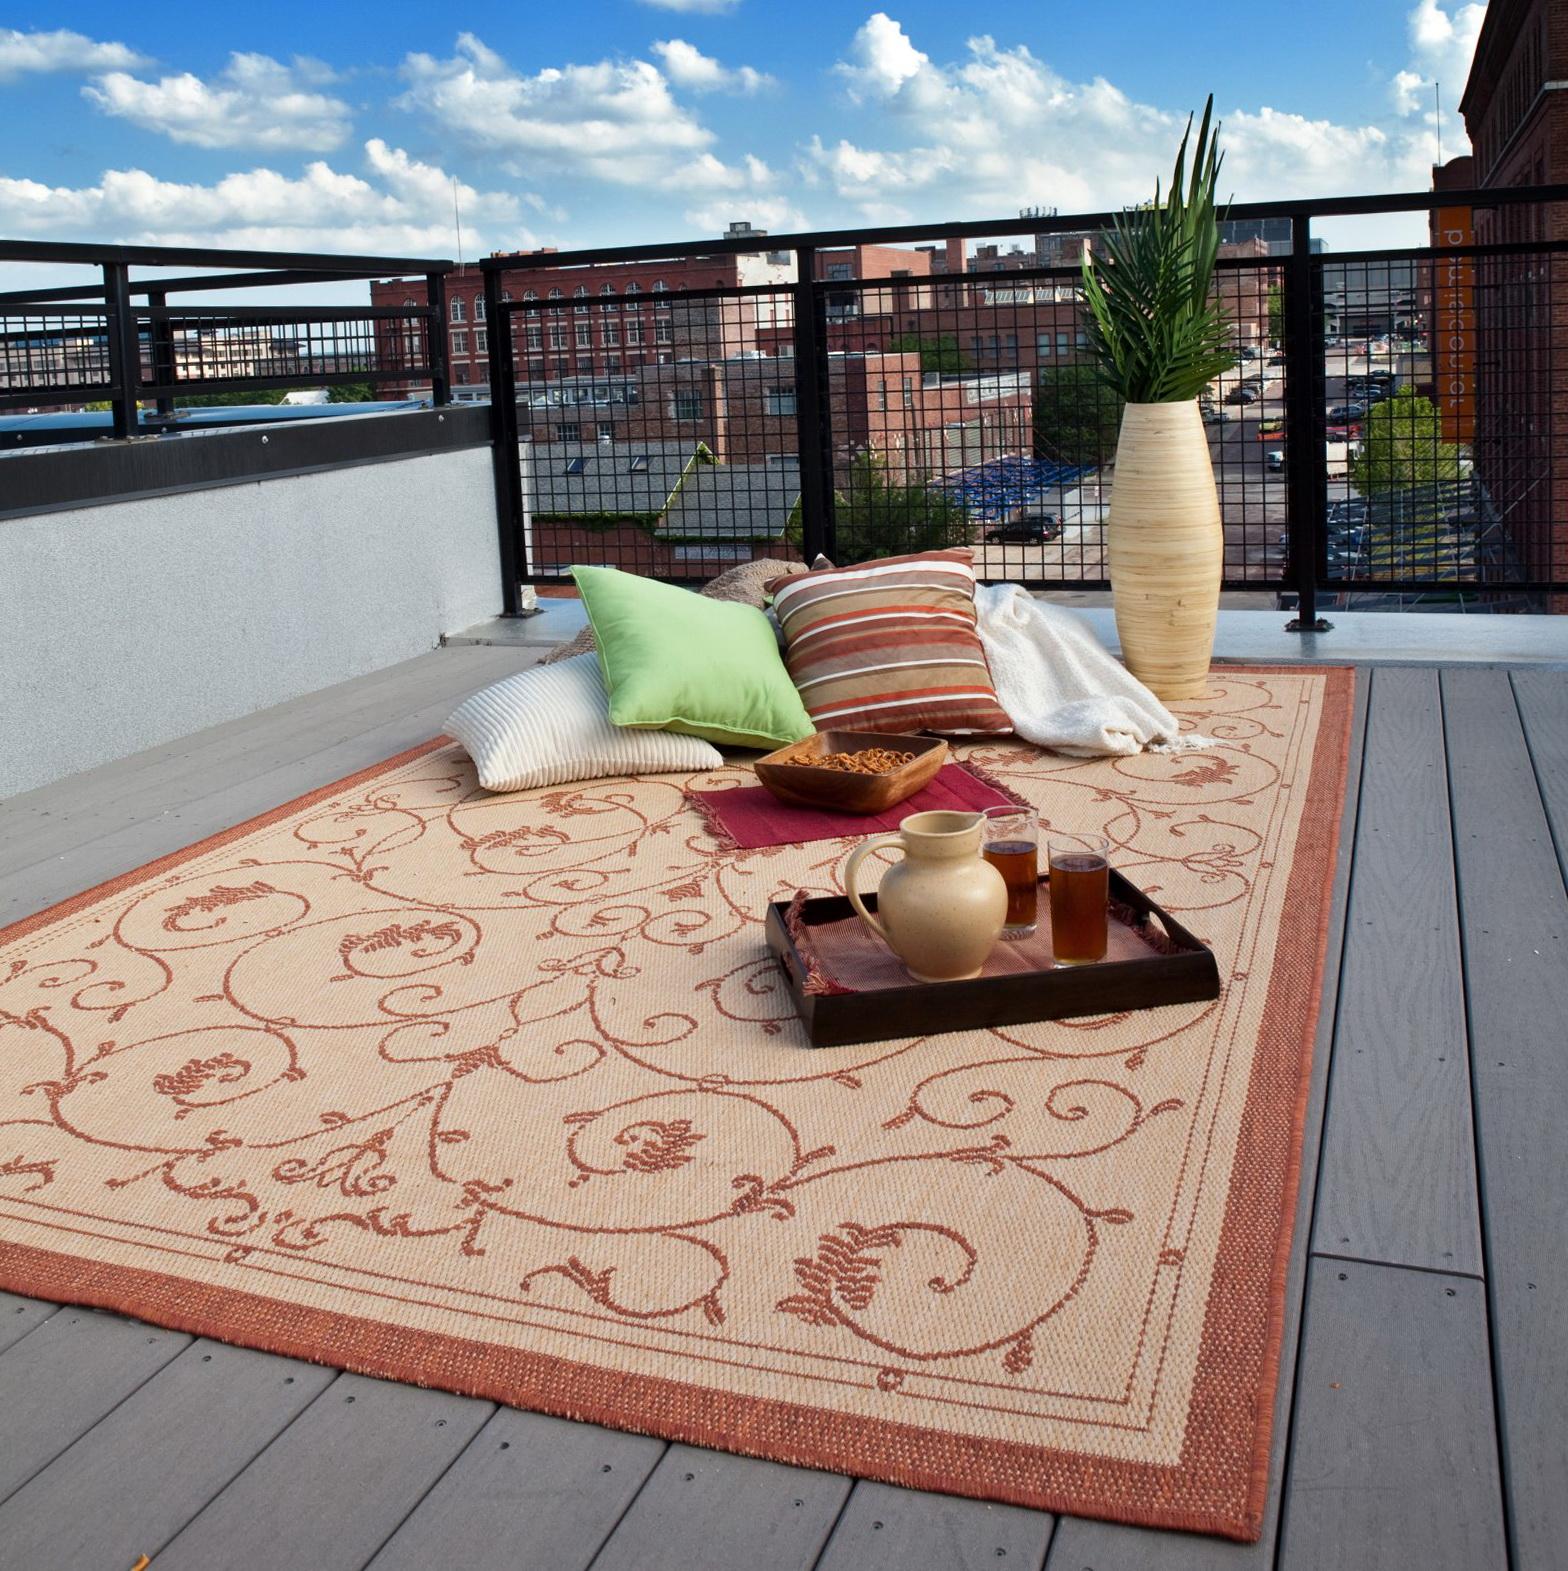 9 12 outdoor carpet for decks home design ideas - Craigslist swimming pools for sale ...